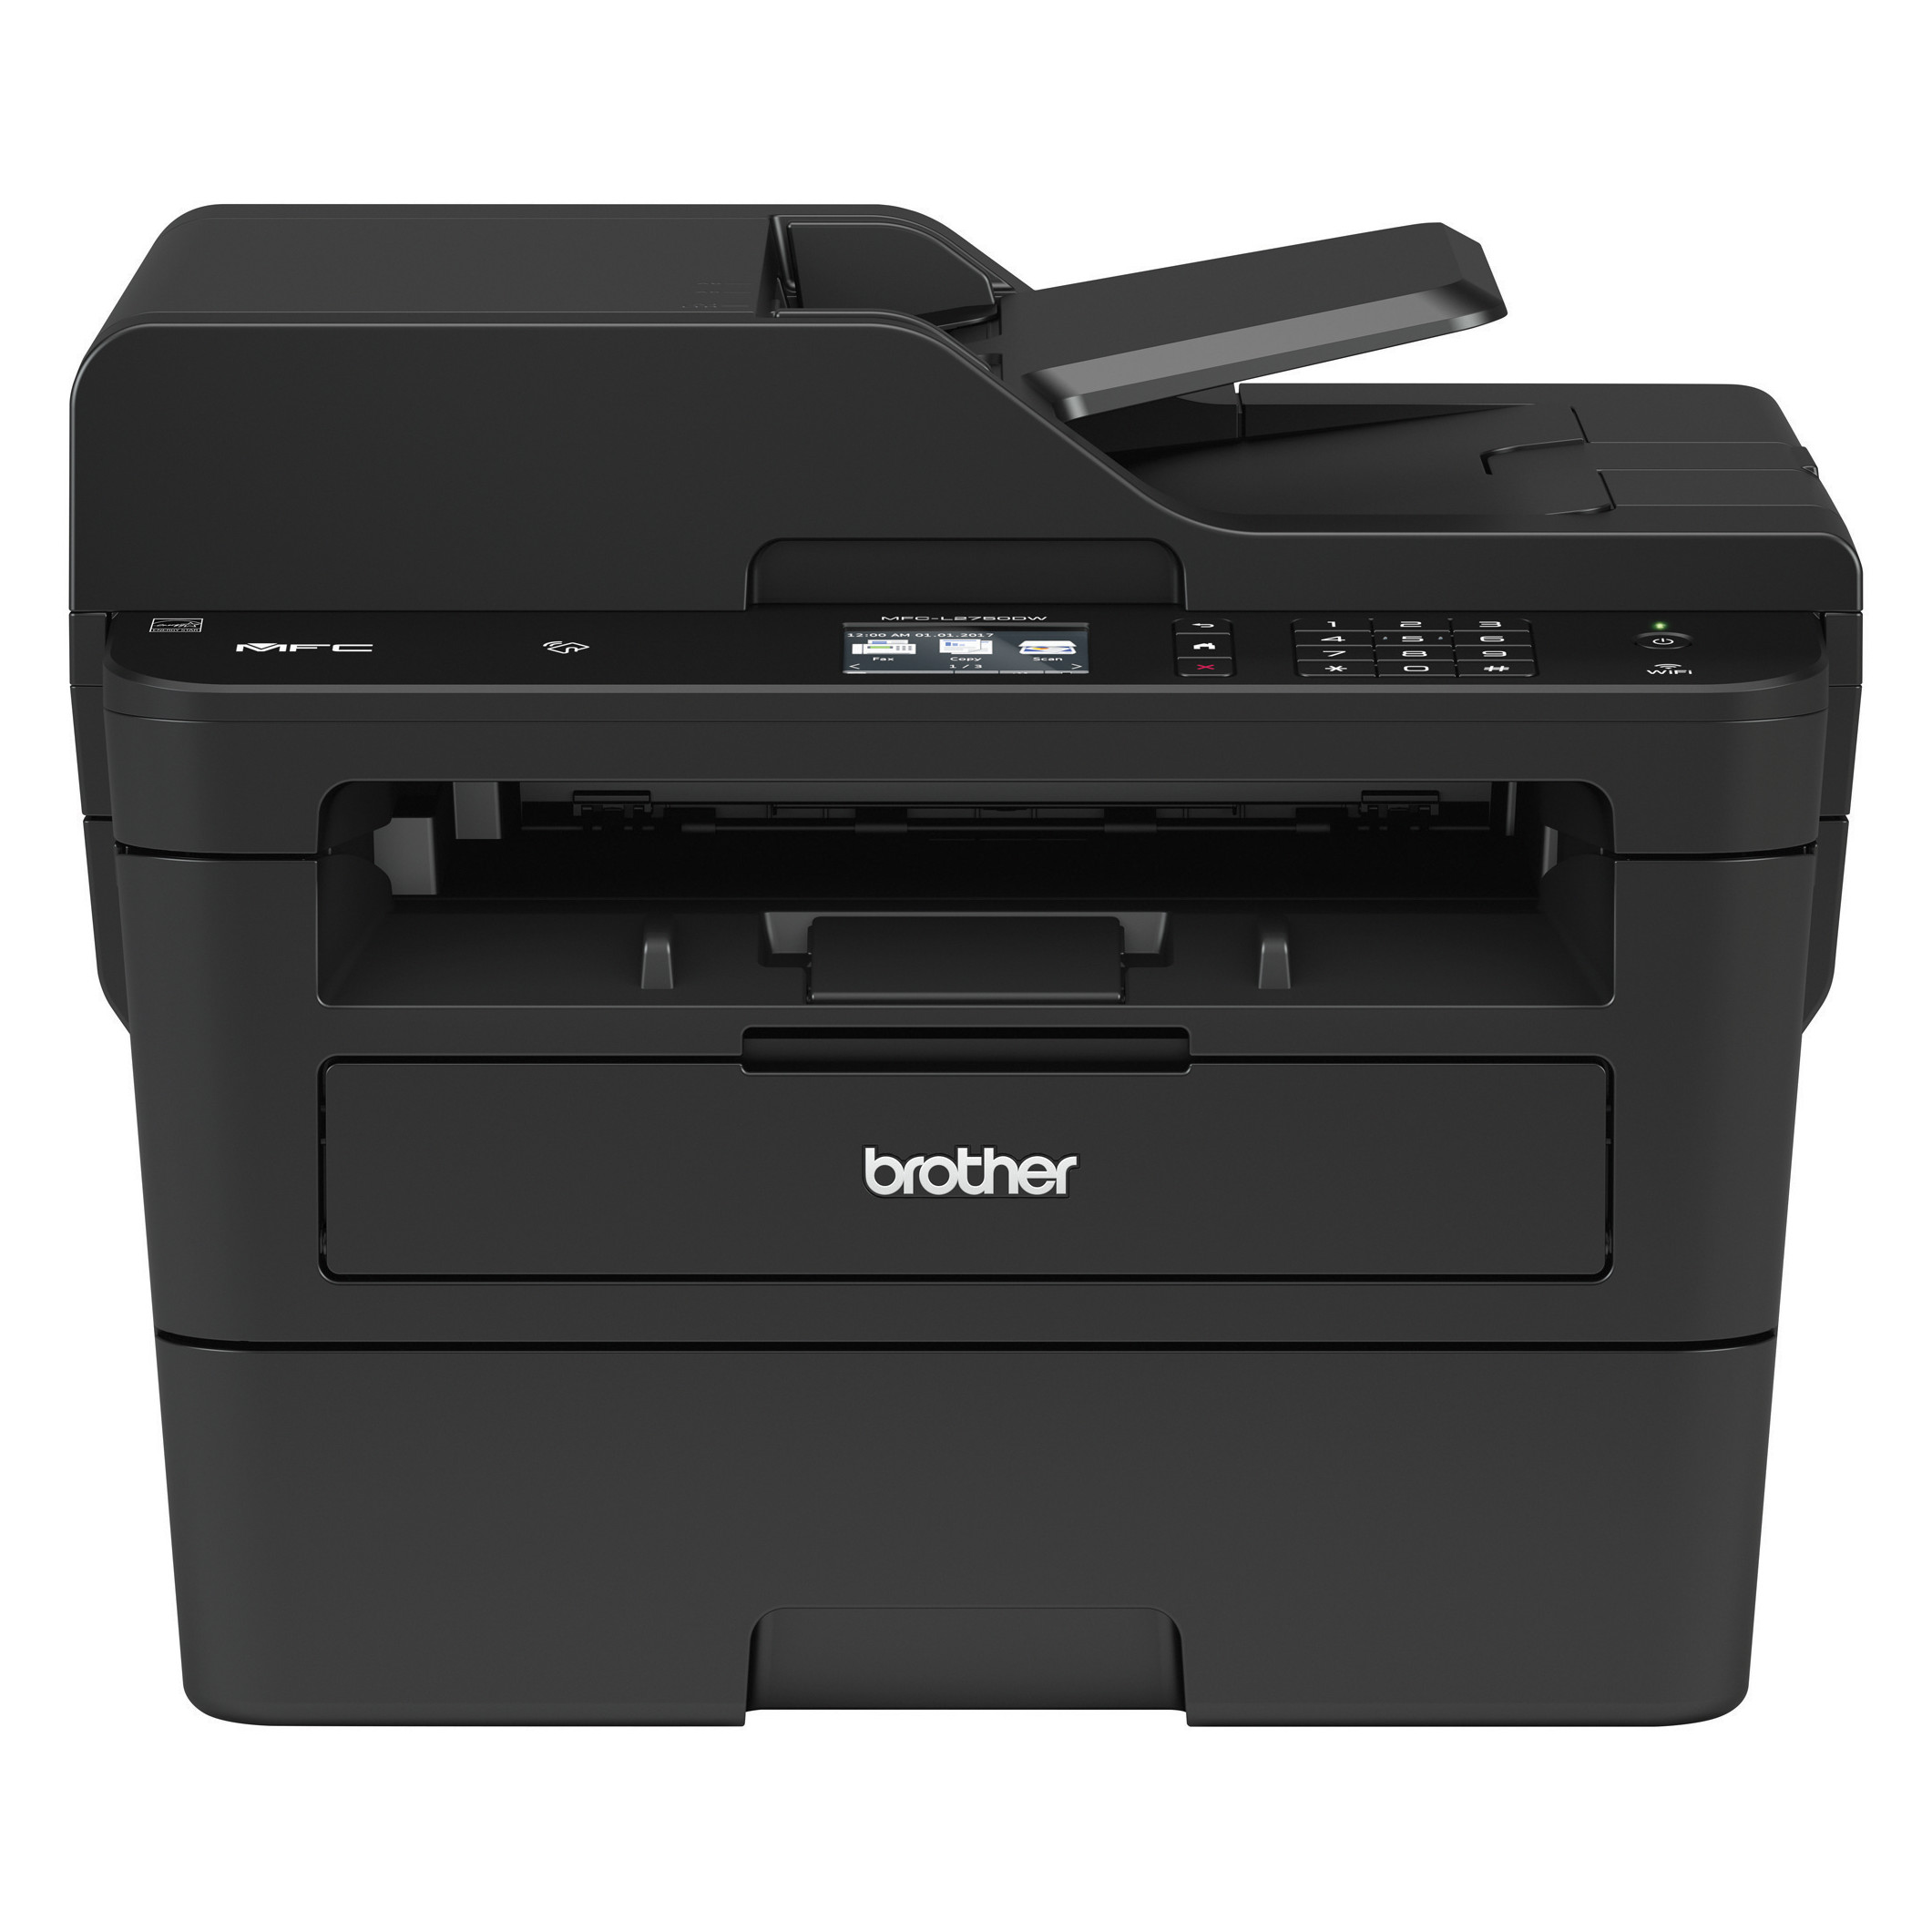 Brother MFC-8500 Scanner Windows 7